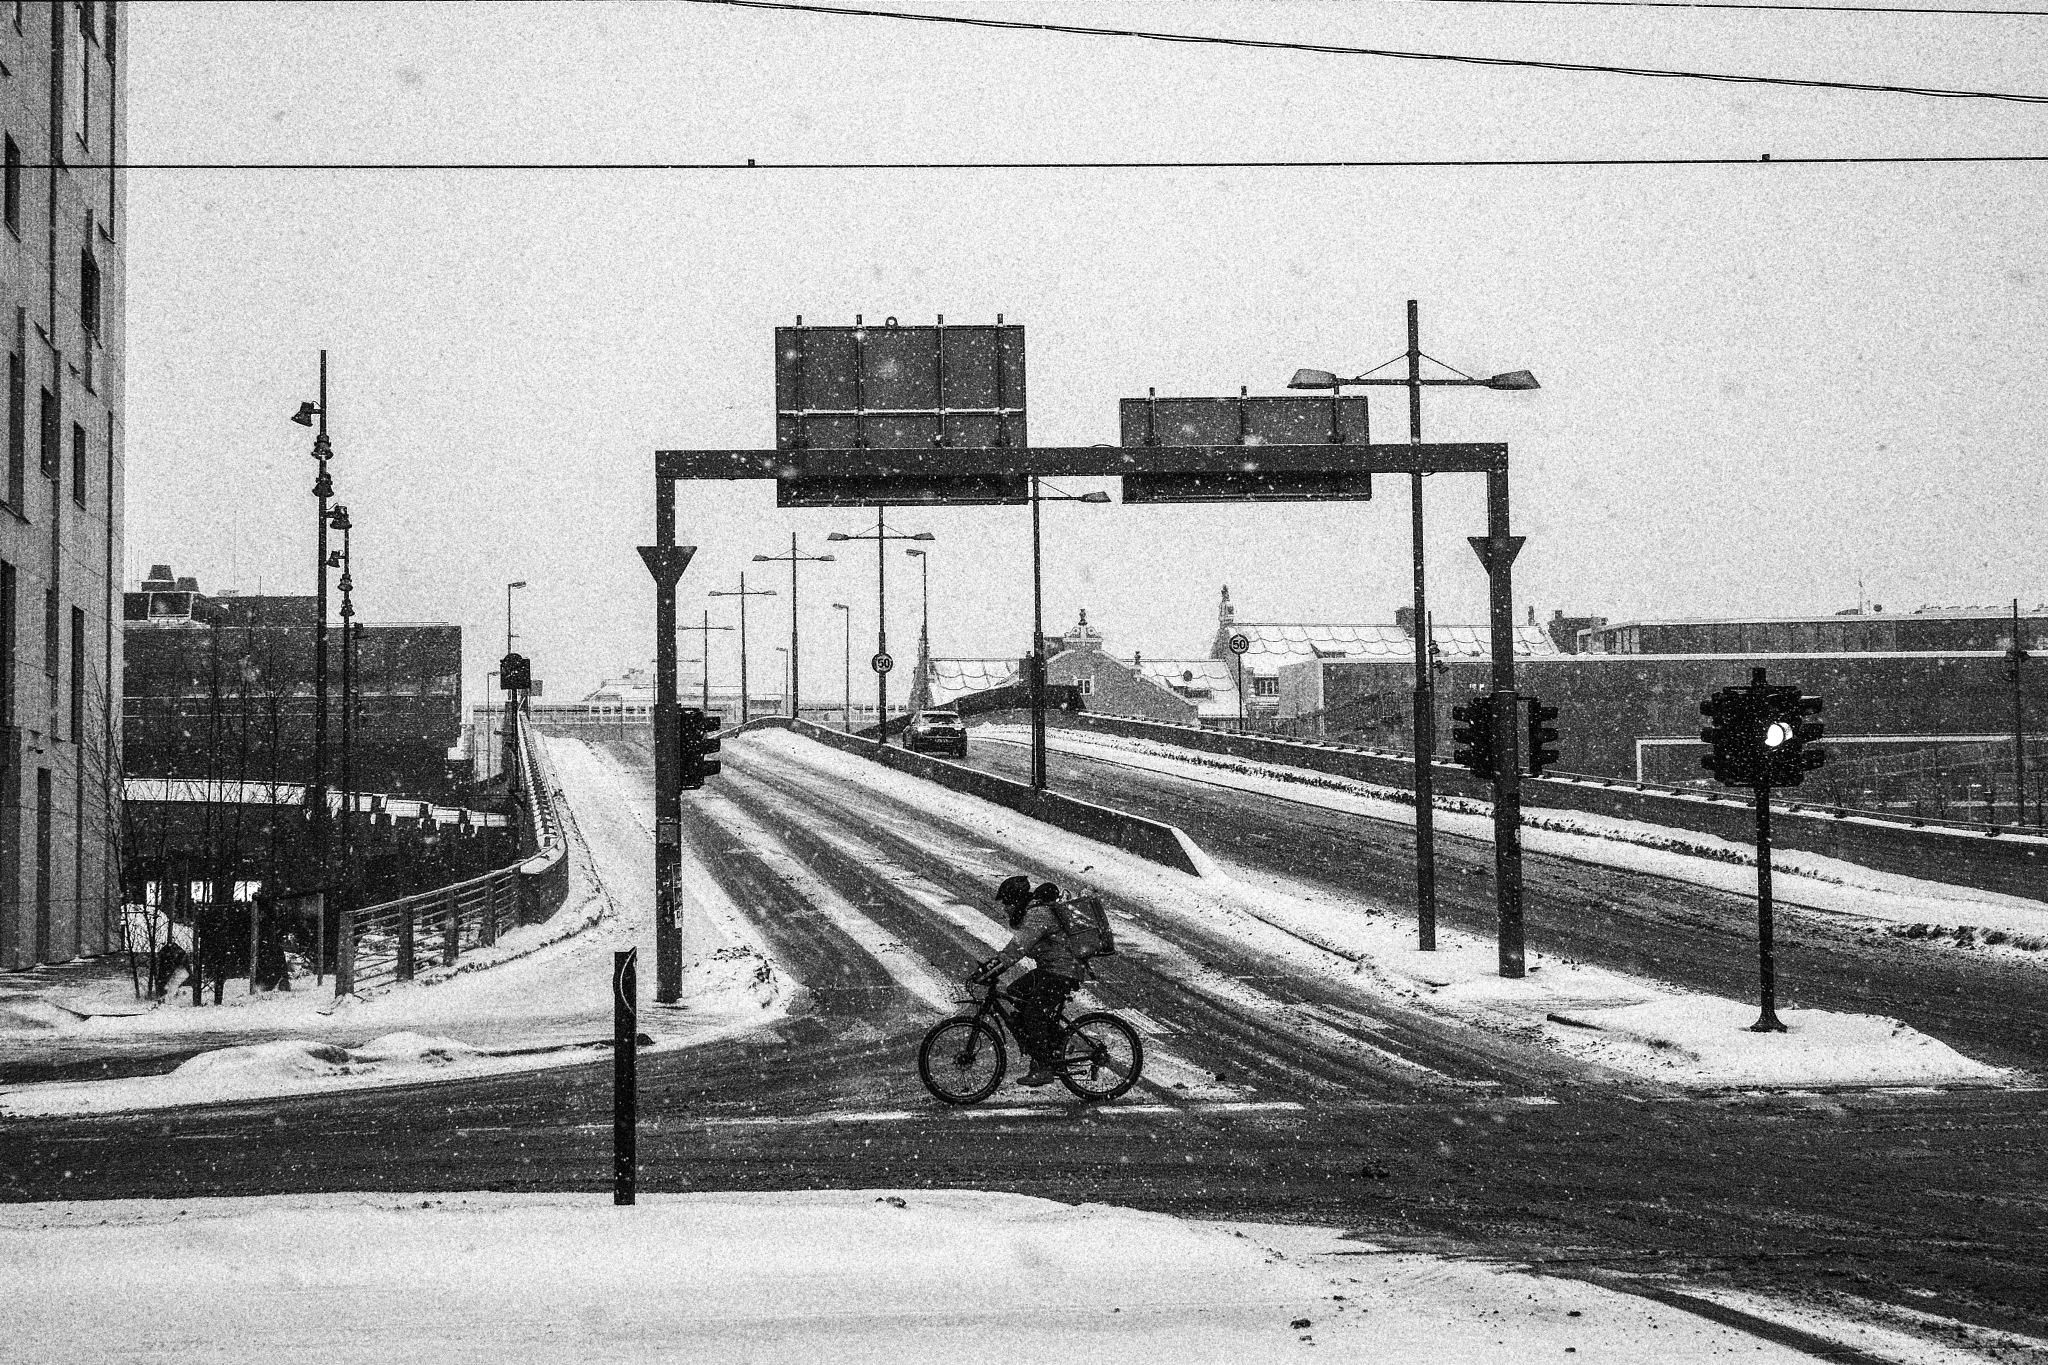 Norwegian winter Kamikaze in Oslo by Goran Jorganovich